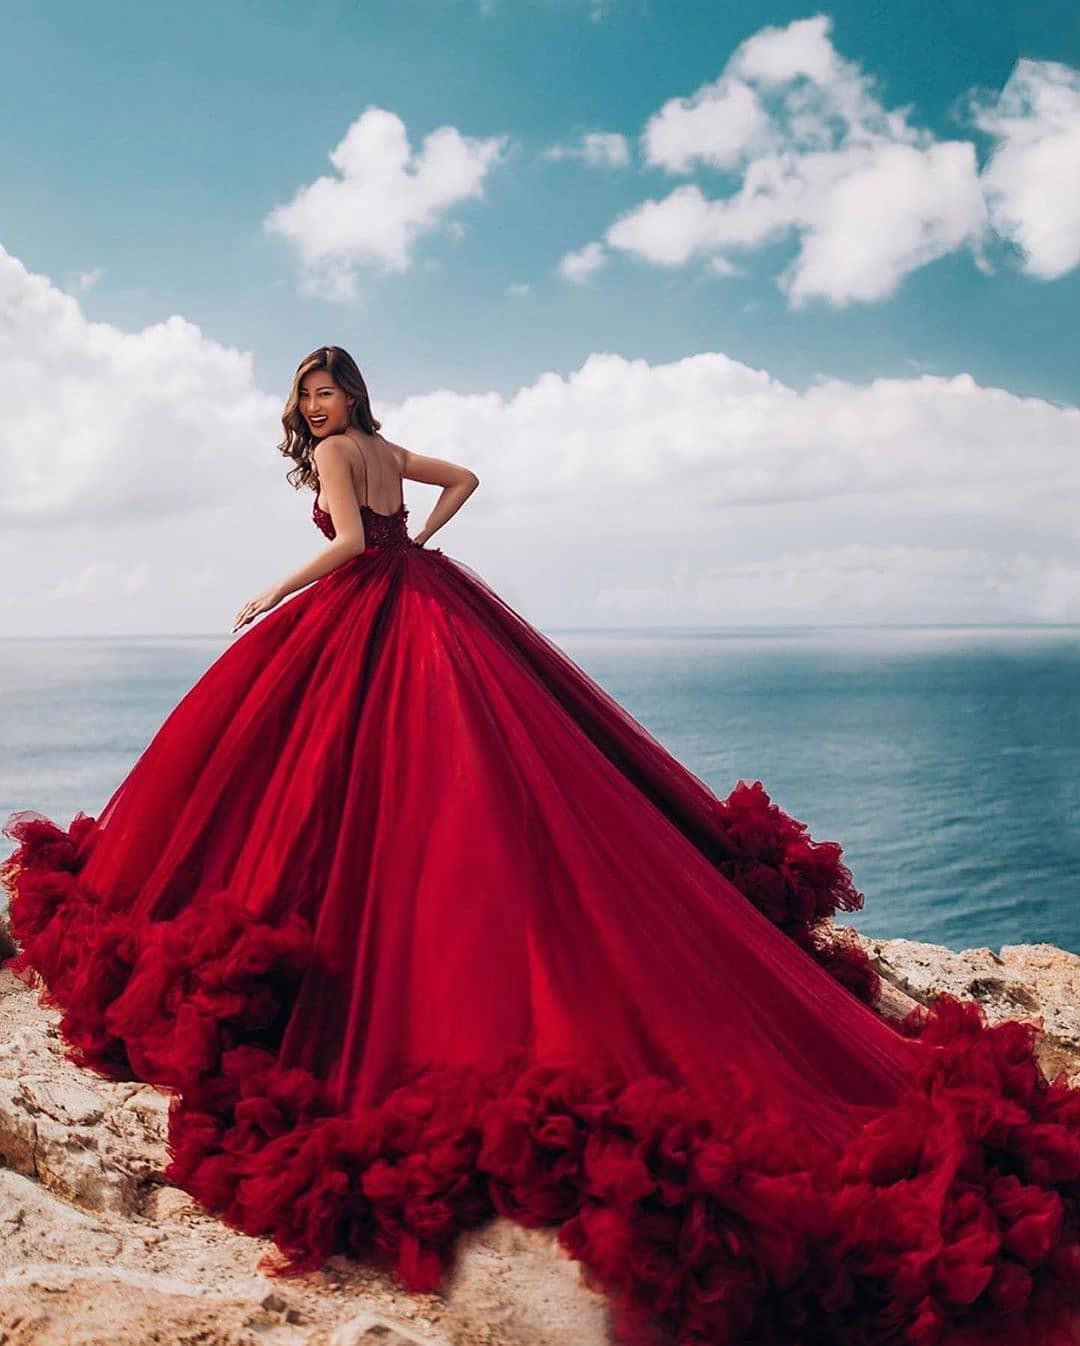 Red Dress 4Dresses Liastubllaofficial - Weddings